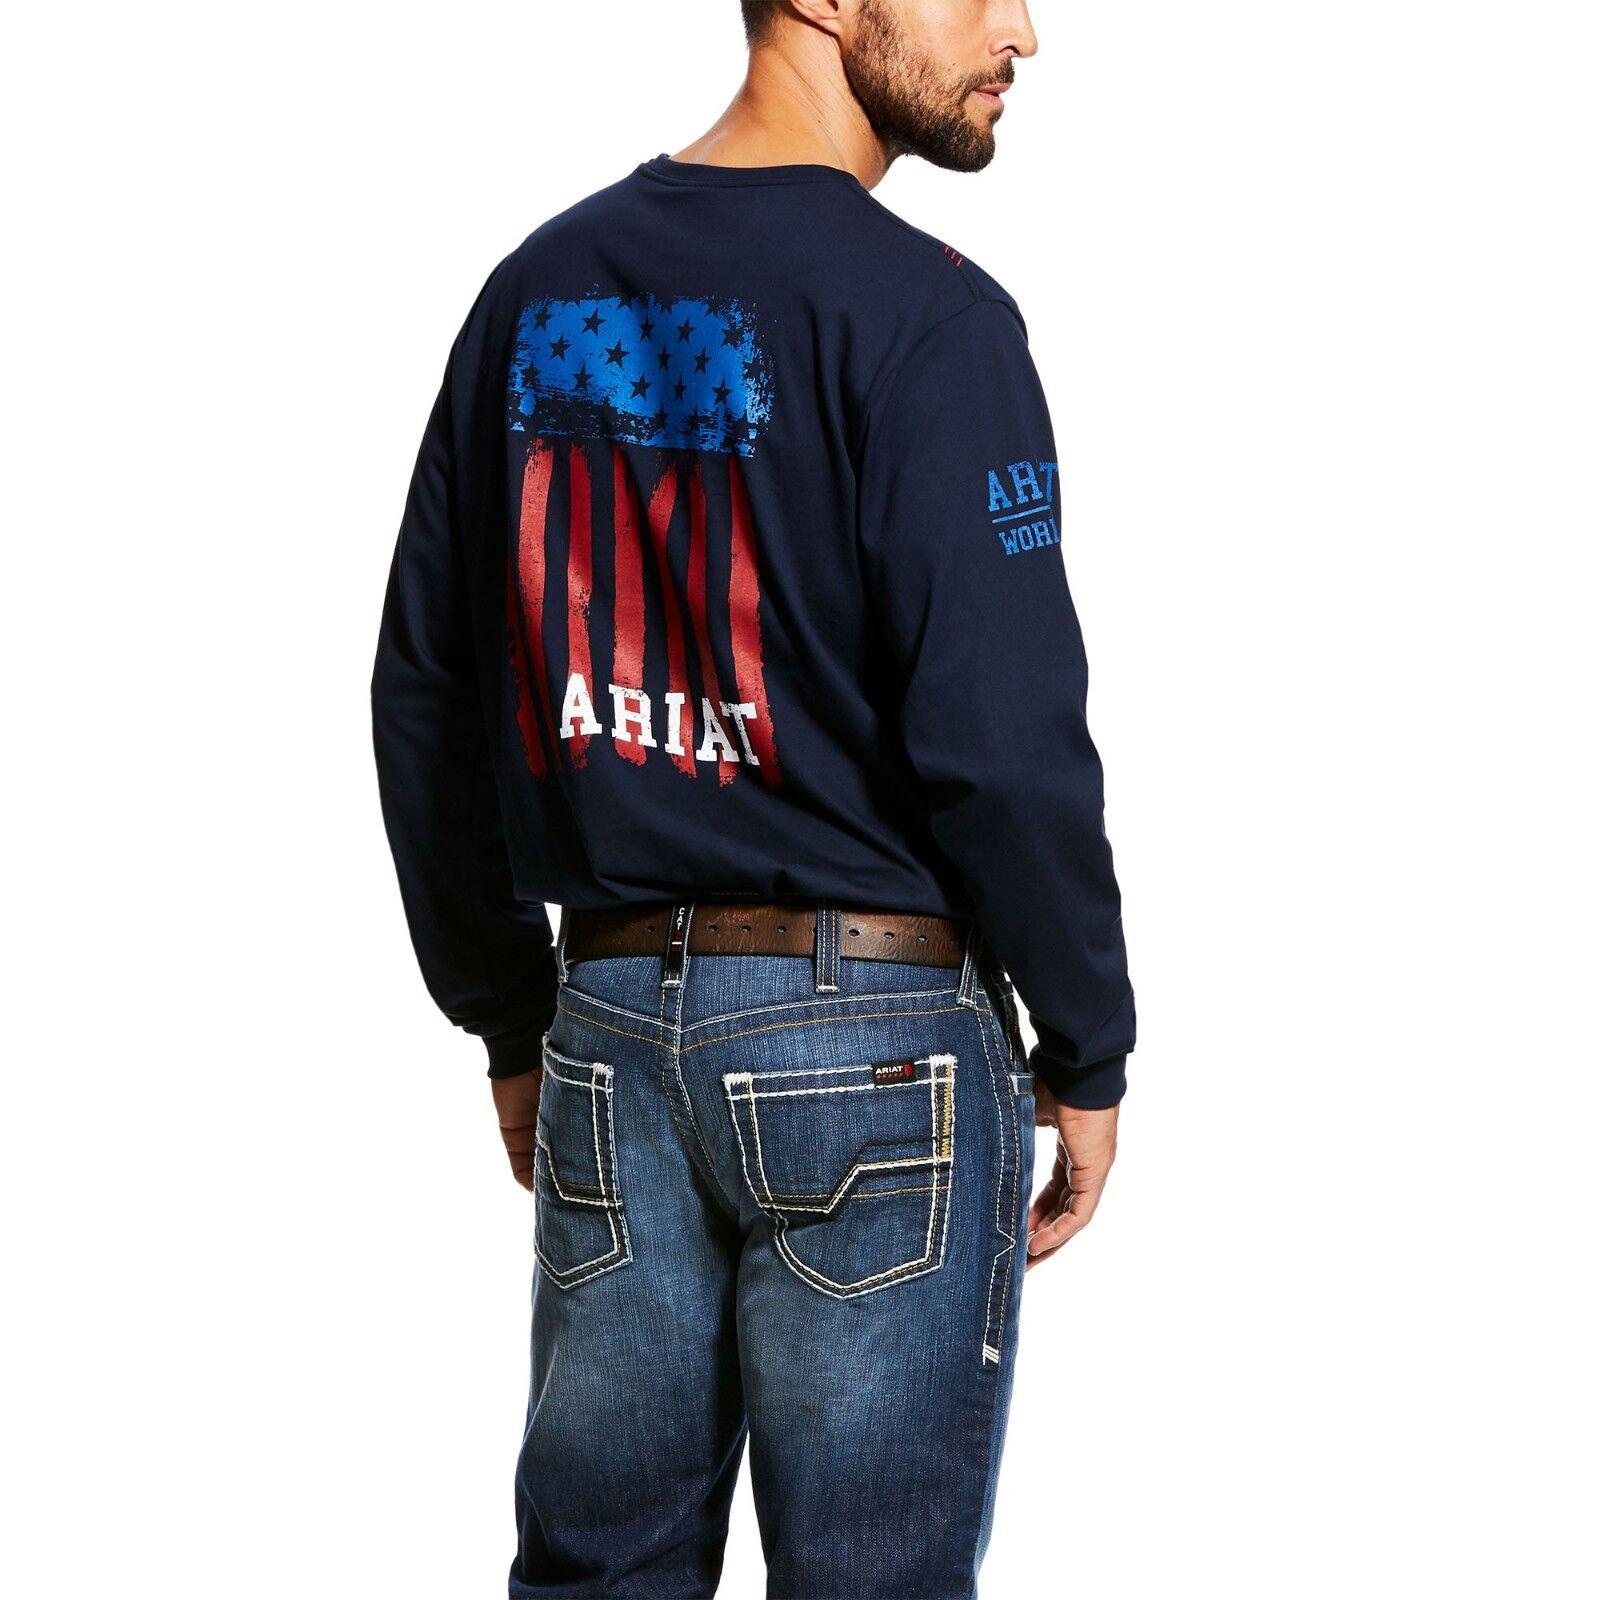 Ariat® Men's FR Americana Graphic Crew Navy T-Shirt 10023951